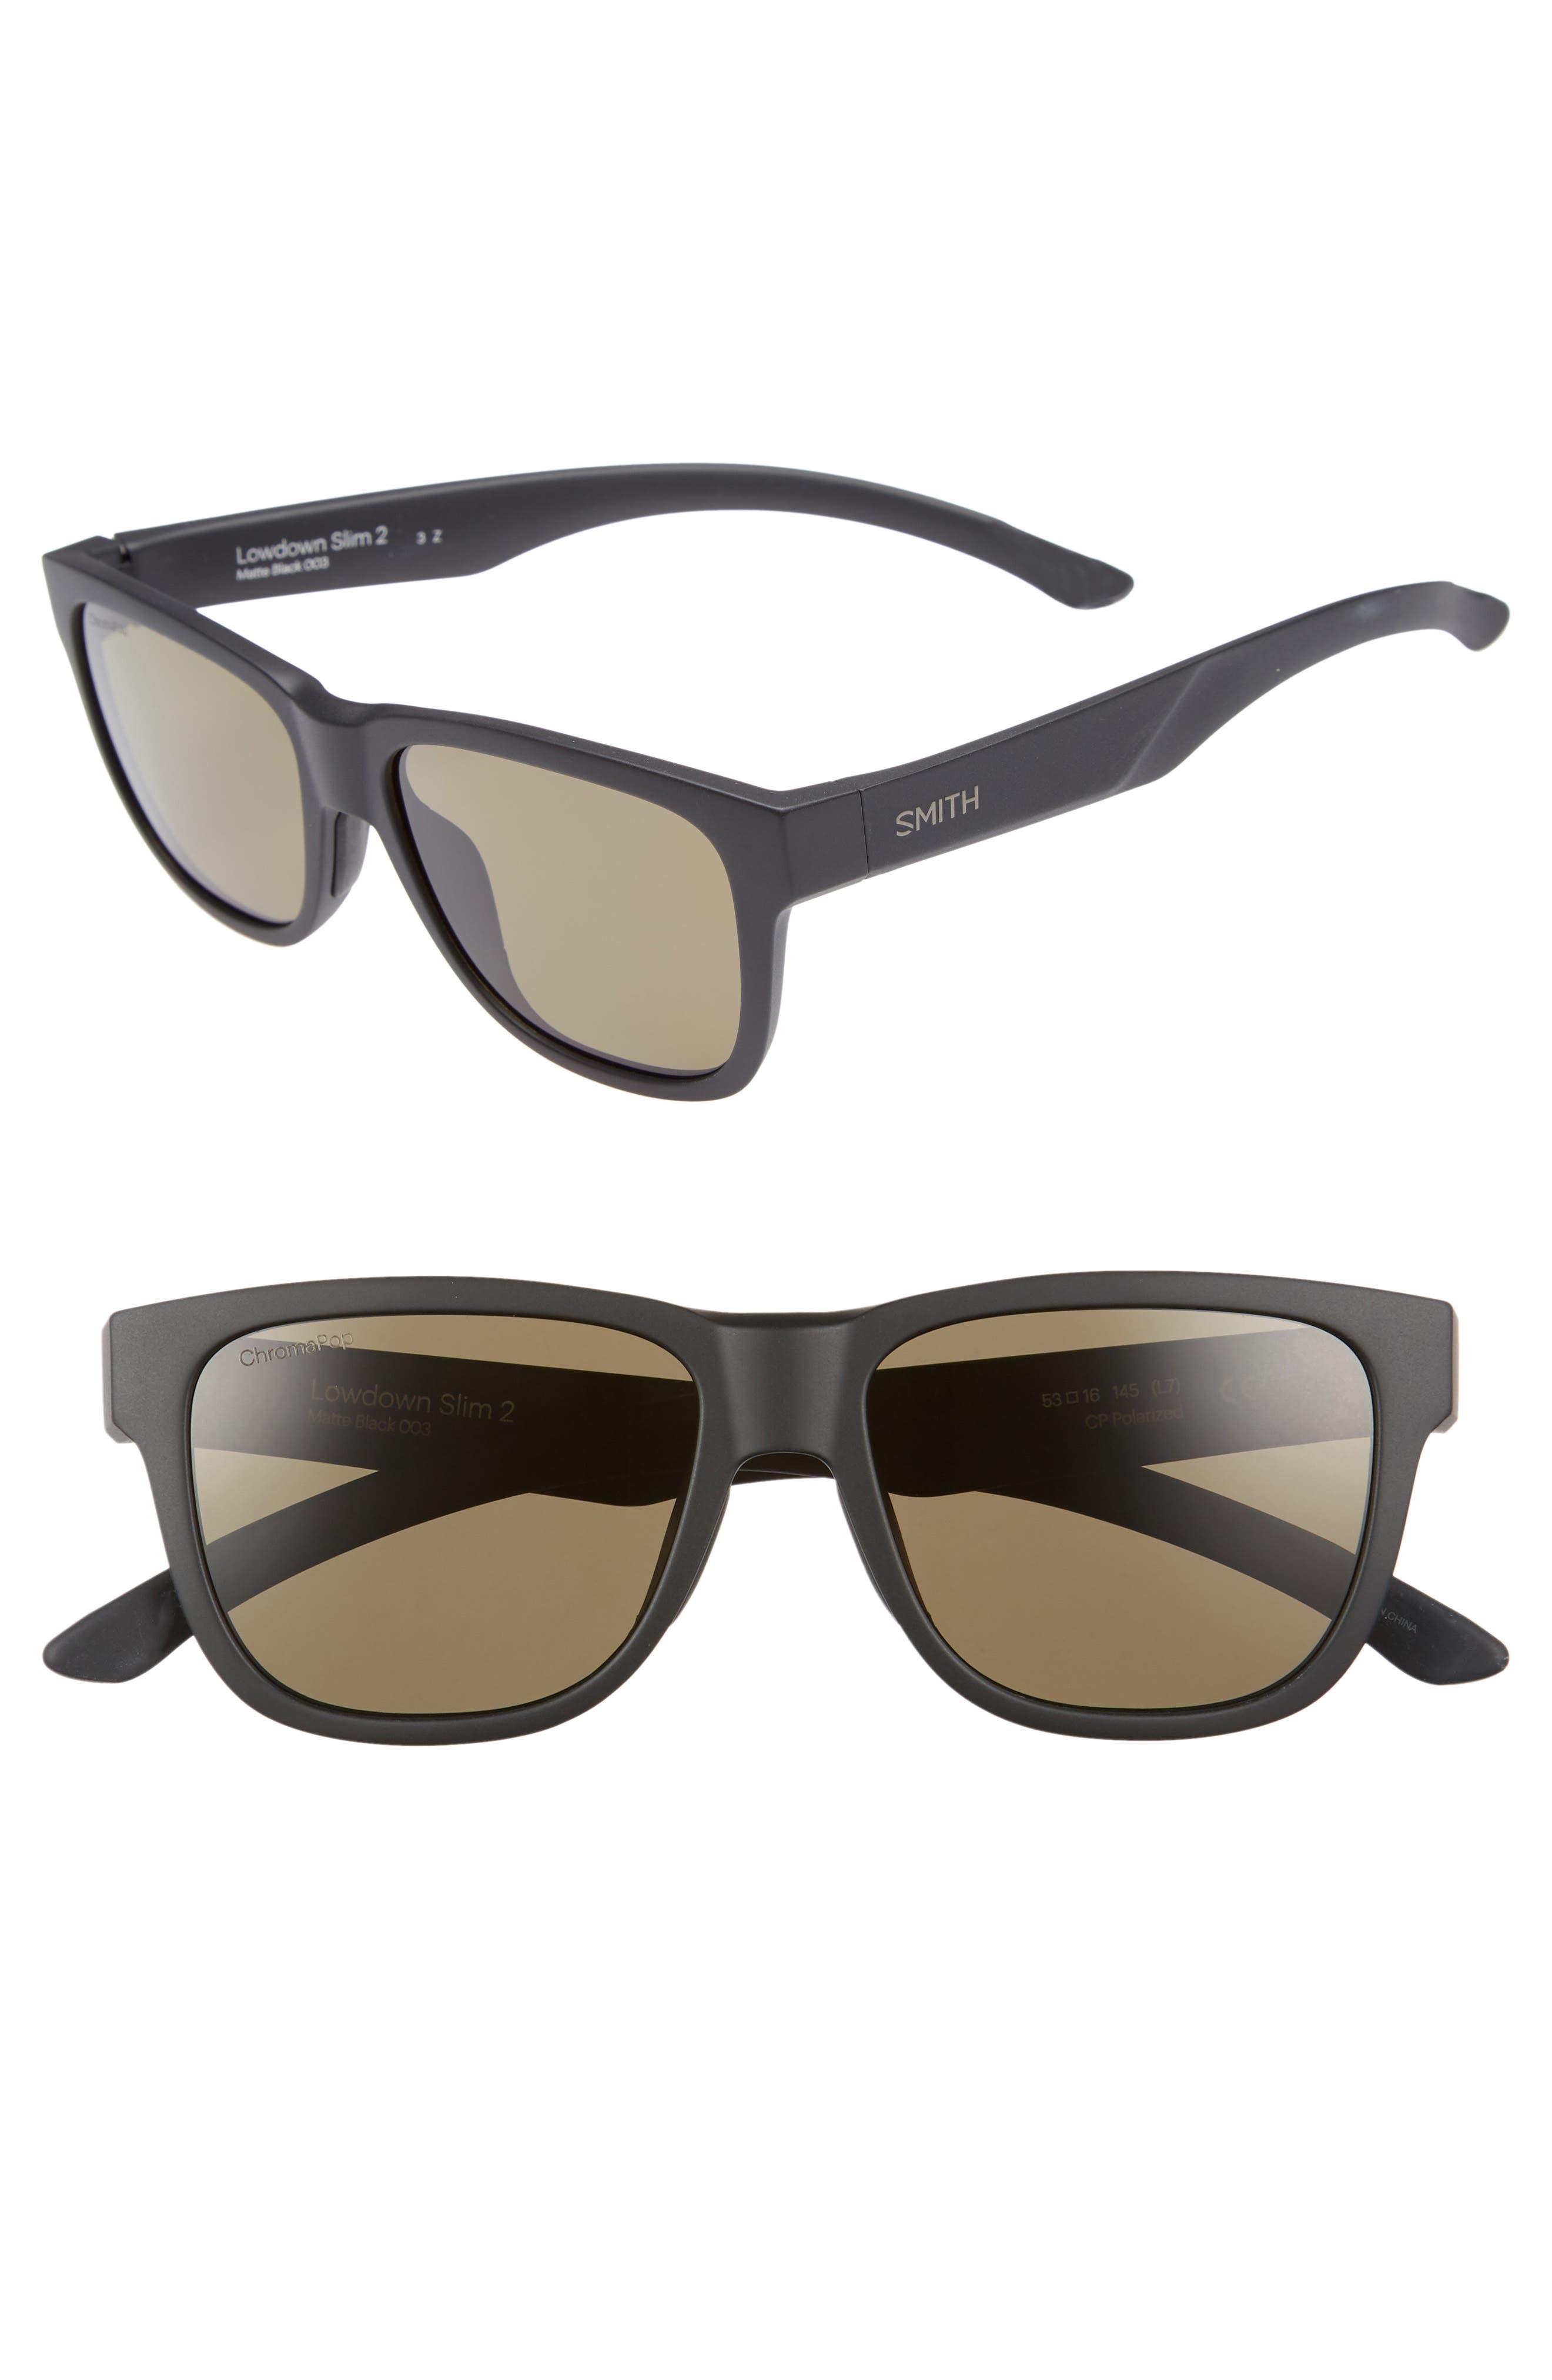 Lowdown Slim 2 53mm ChromaPop<sup>™</sup> Square Sunglasses,                             Main thumbnail 1, color,                             MATTE BLACK